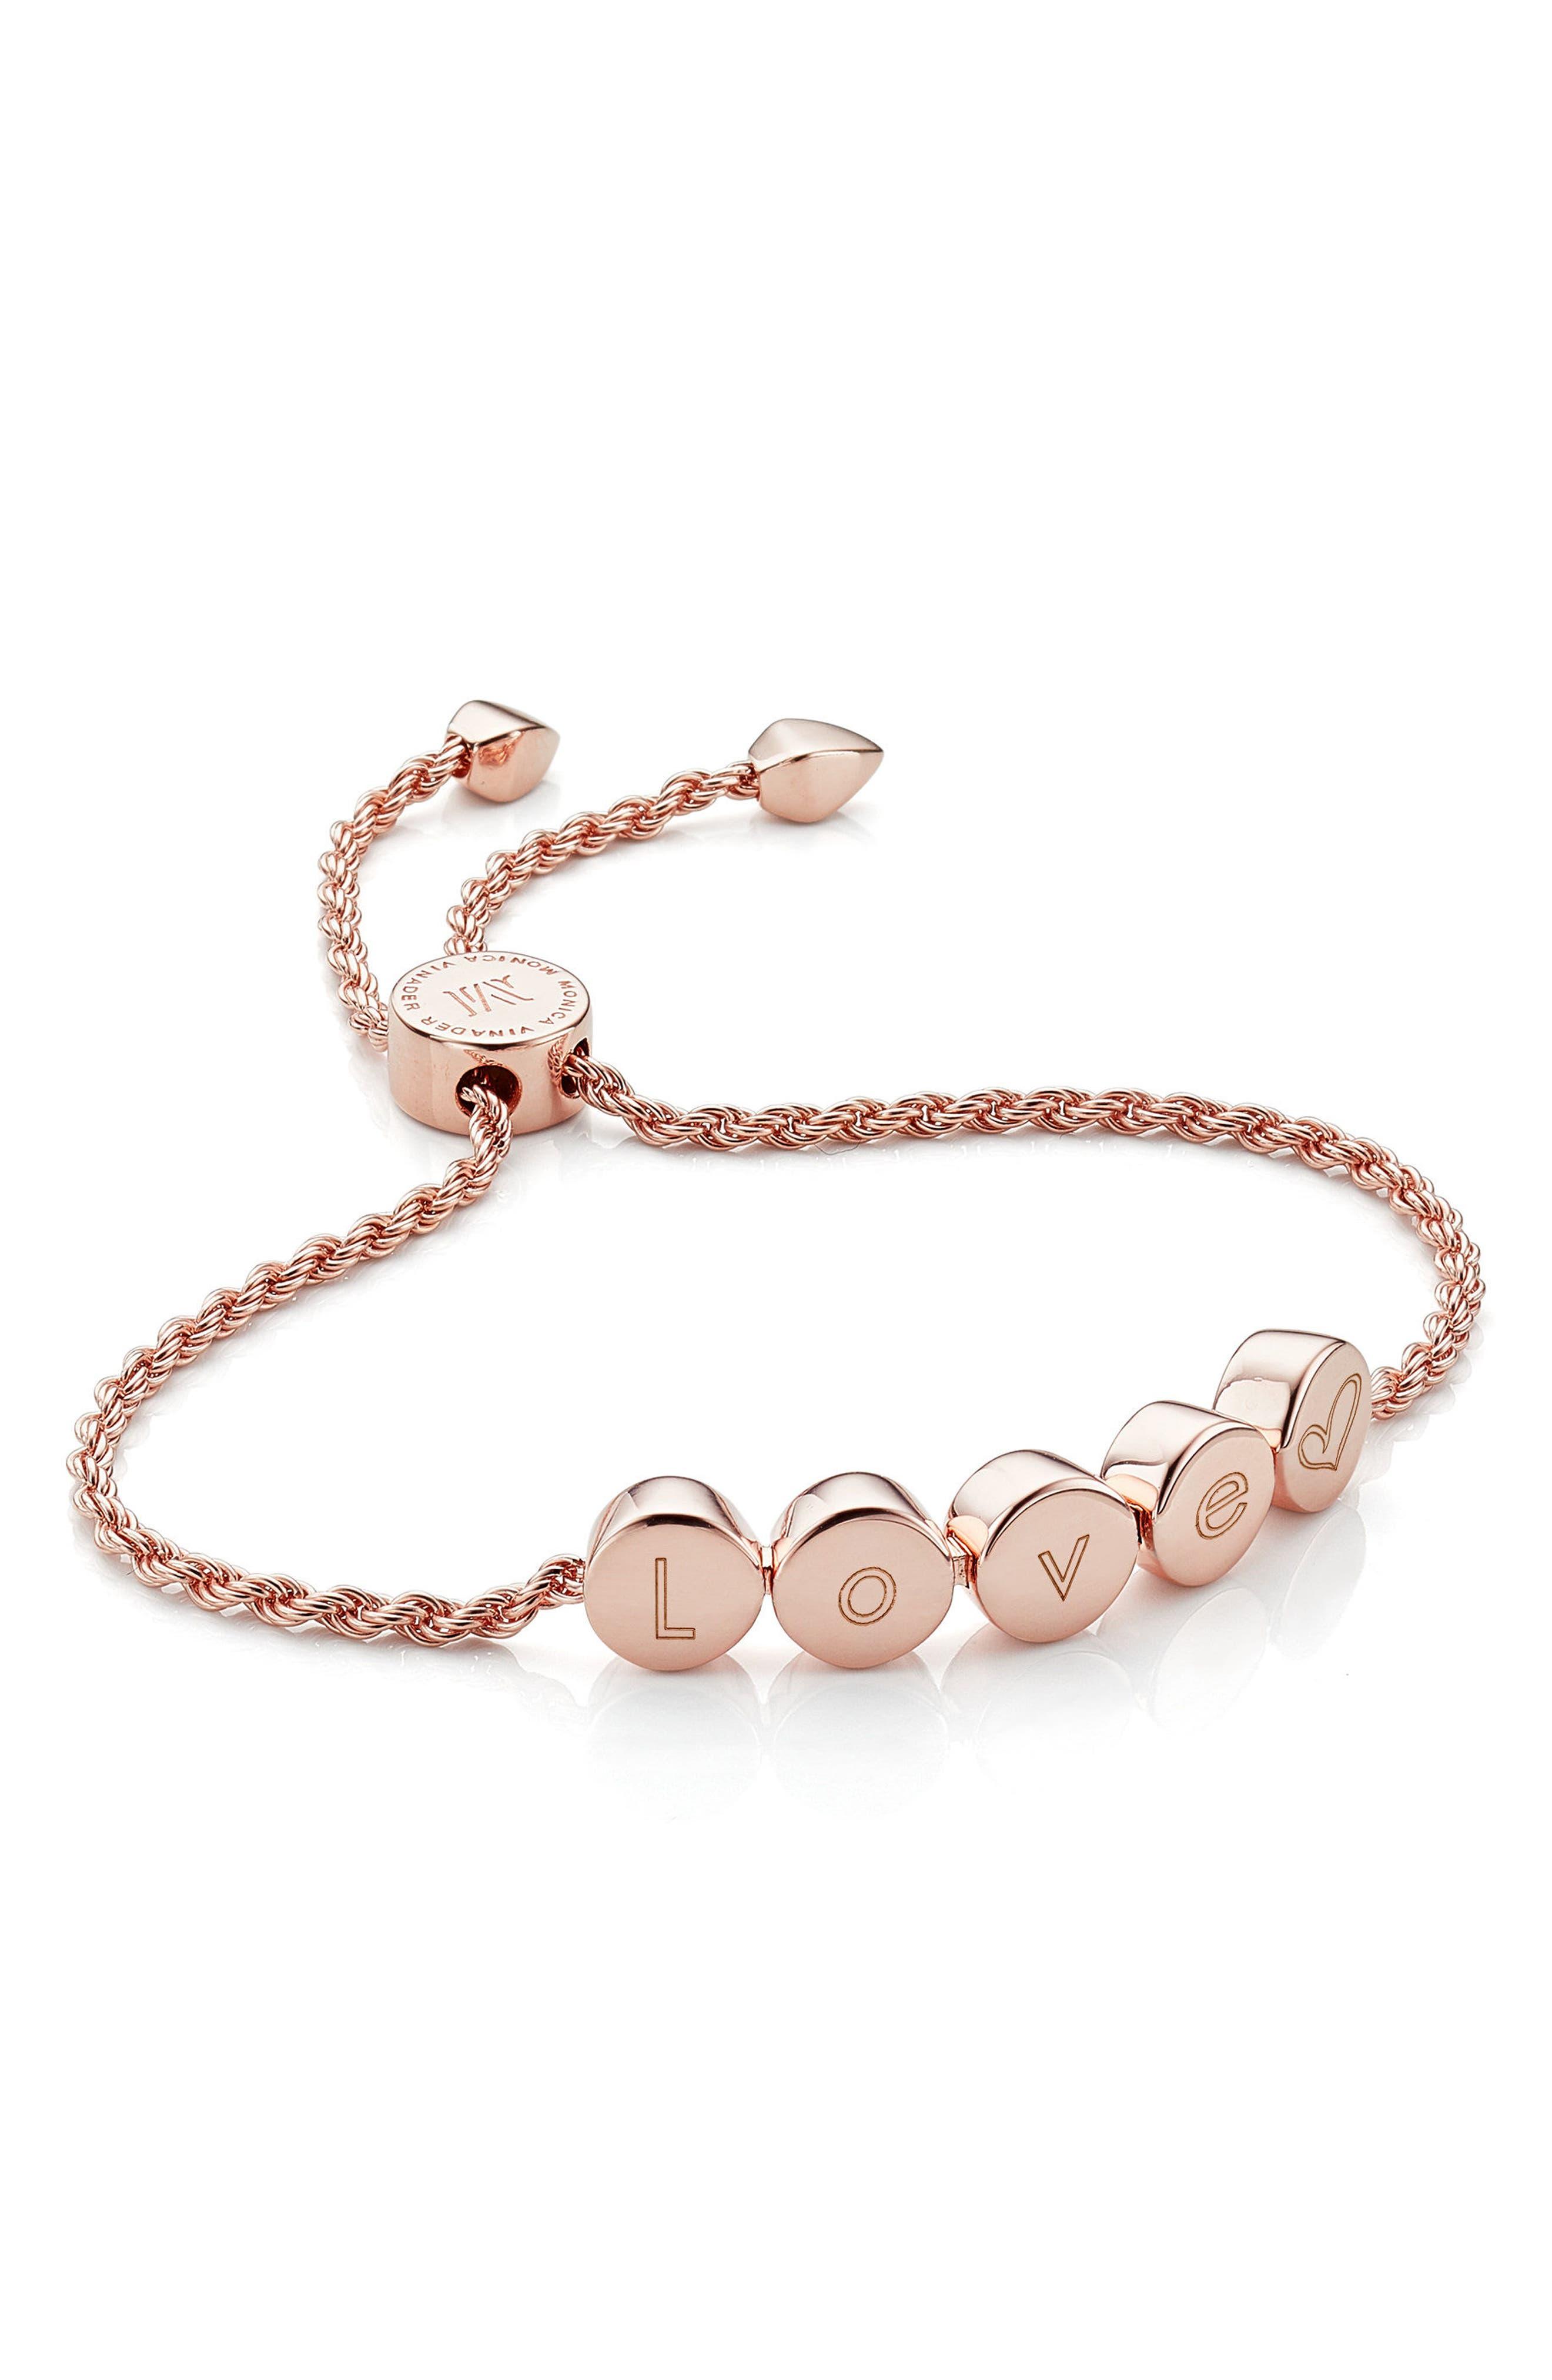 Engravable Linear Bead Friendship Bracelet,                             Alternate thumbnail 2, color,                             Rose Gold